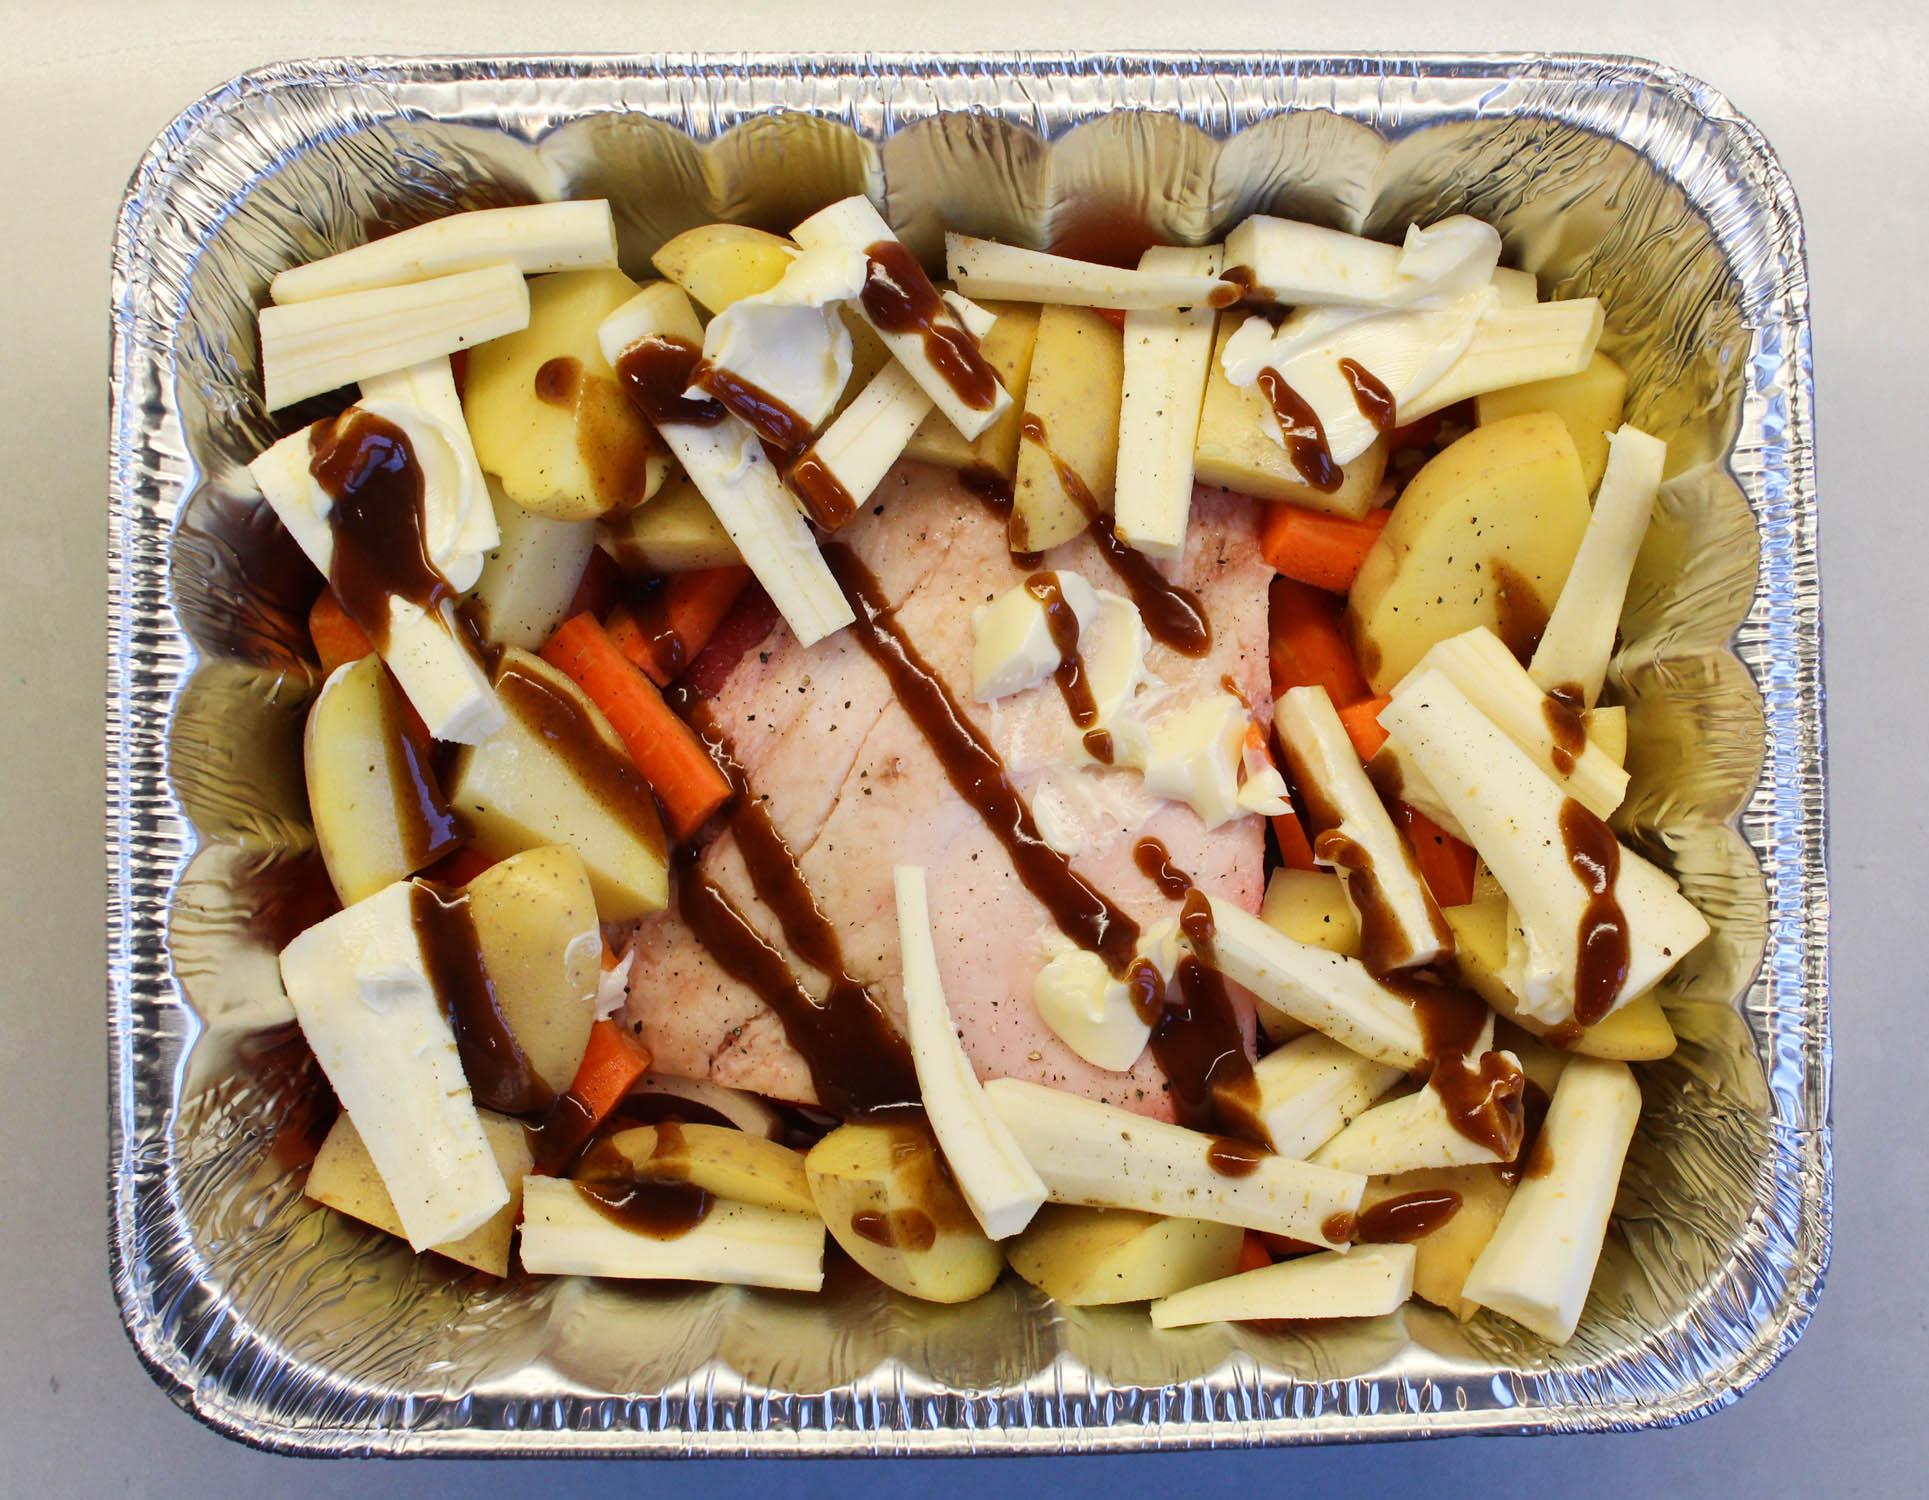 uncooked roast